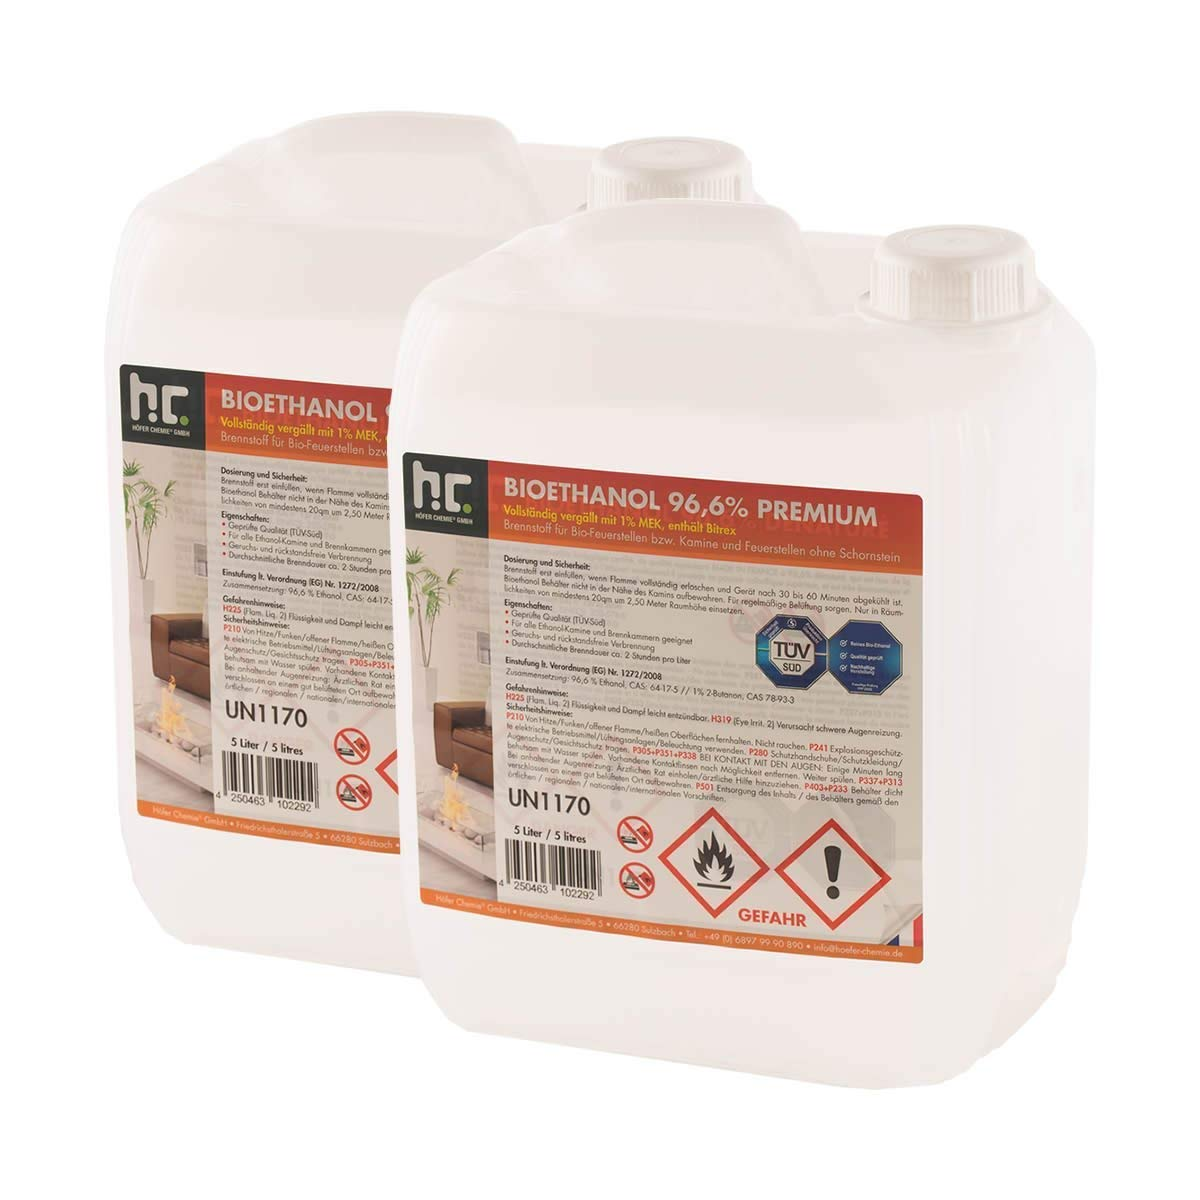 Bio Ethanol Fuel Golden Fire Premium Grade Quality, Clean Burn 5L Containers (15L) B2C